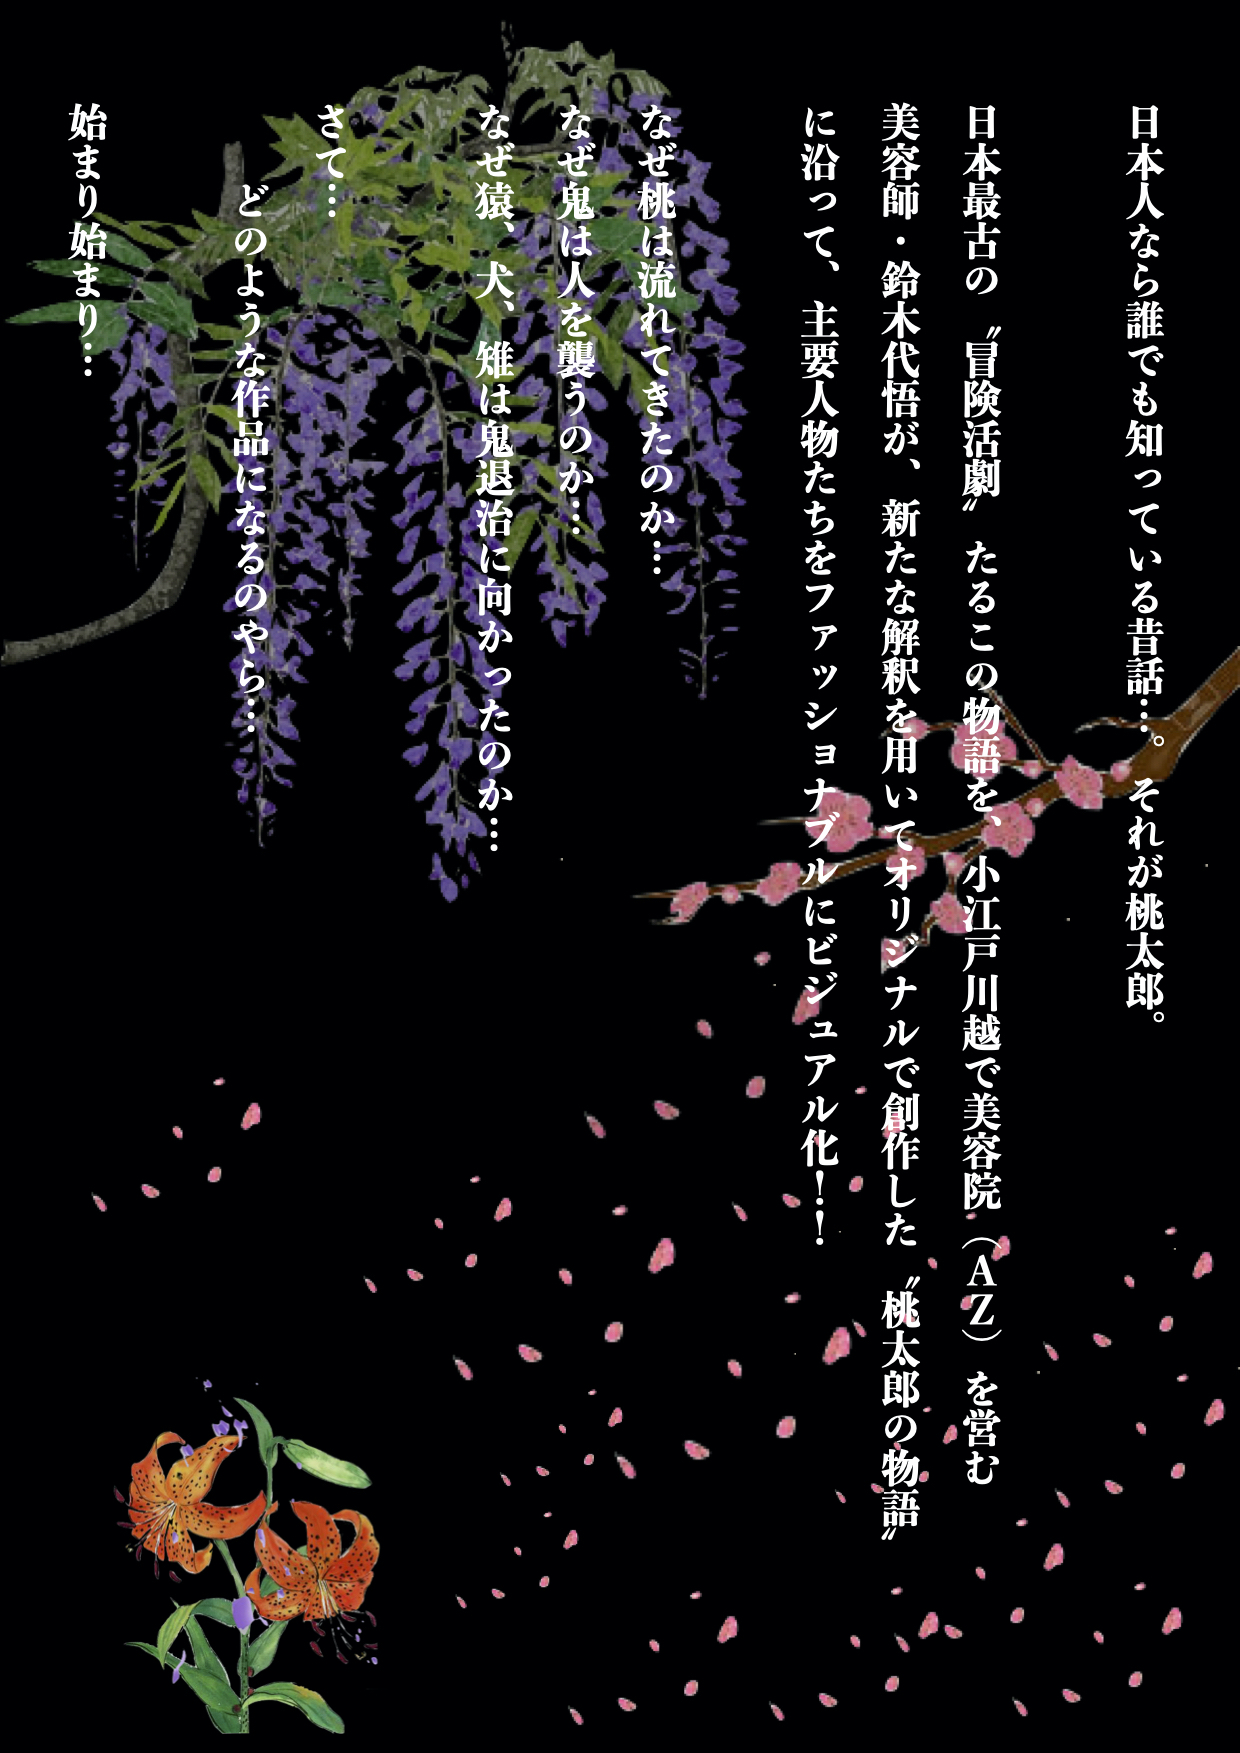 新説桃太郎物語 ベイス 宣伝用12